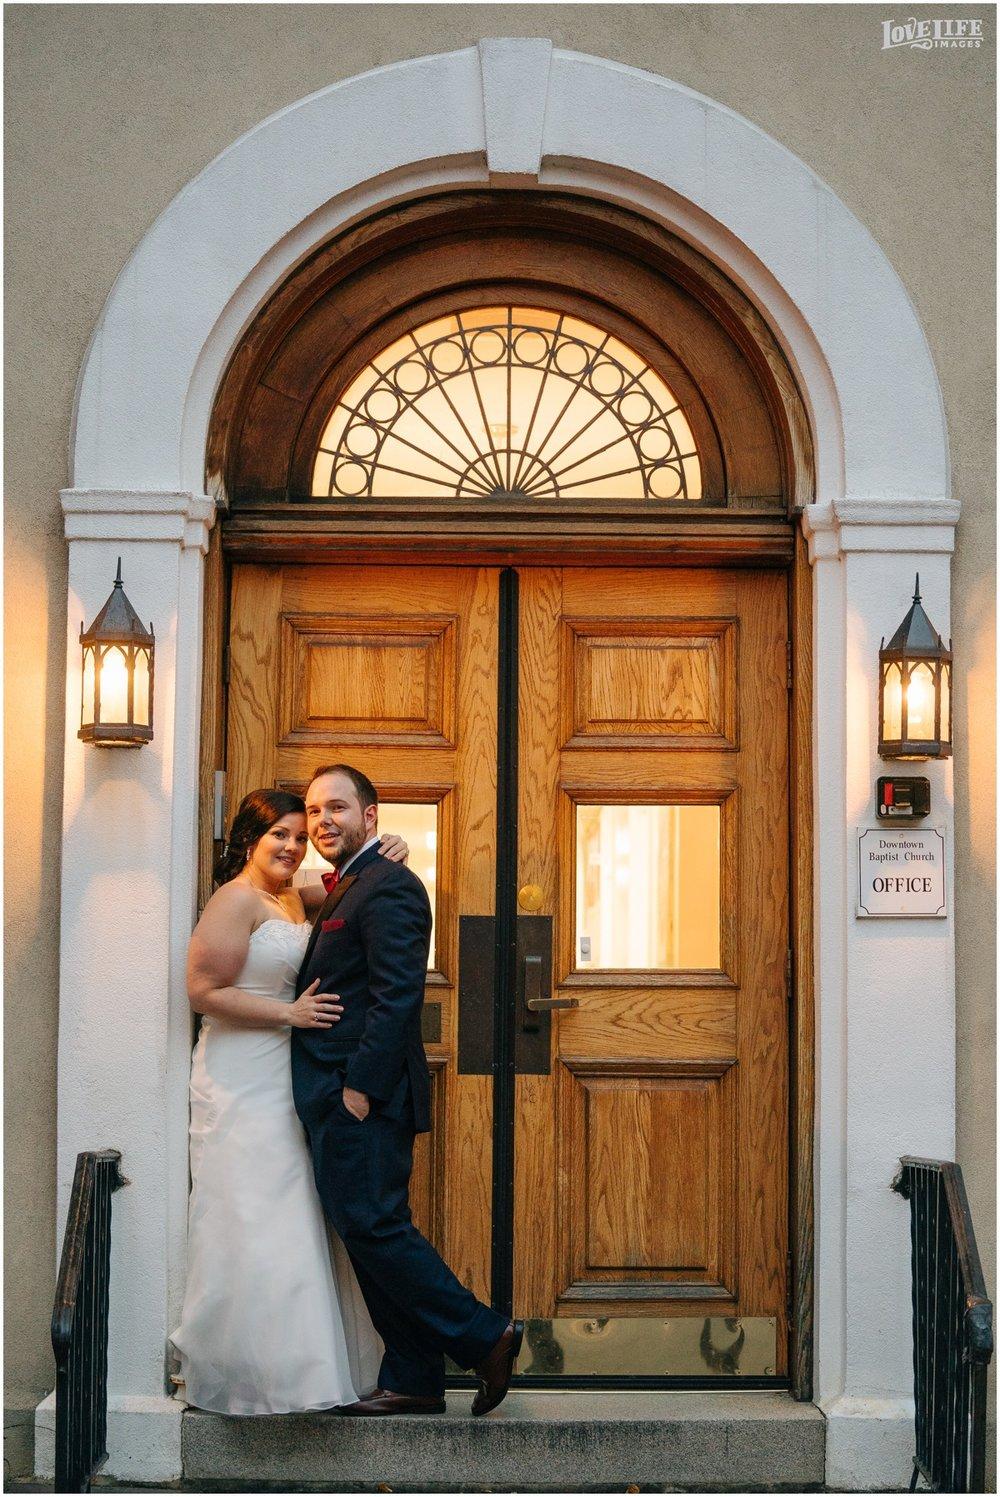 Society Fair VA Wedding nighttime bride groom portrait.jpg